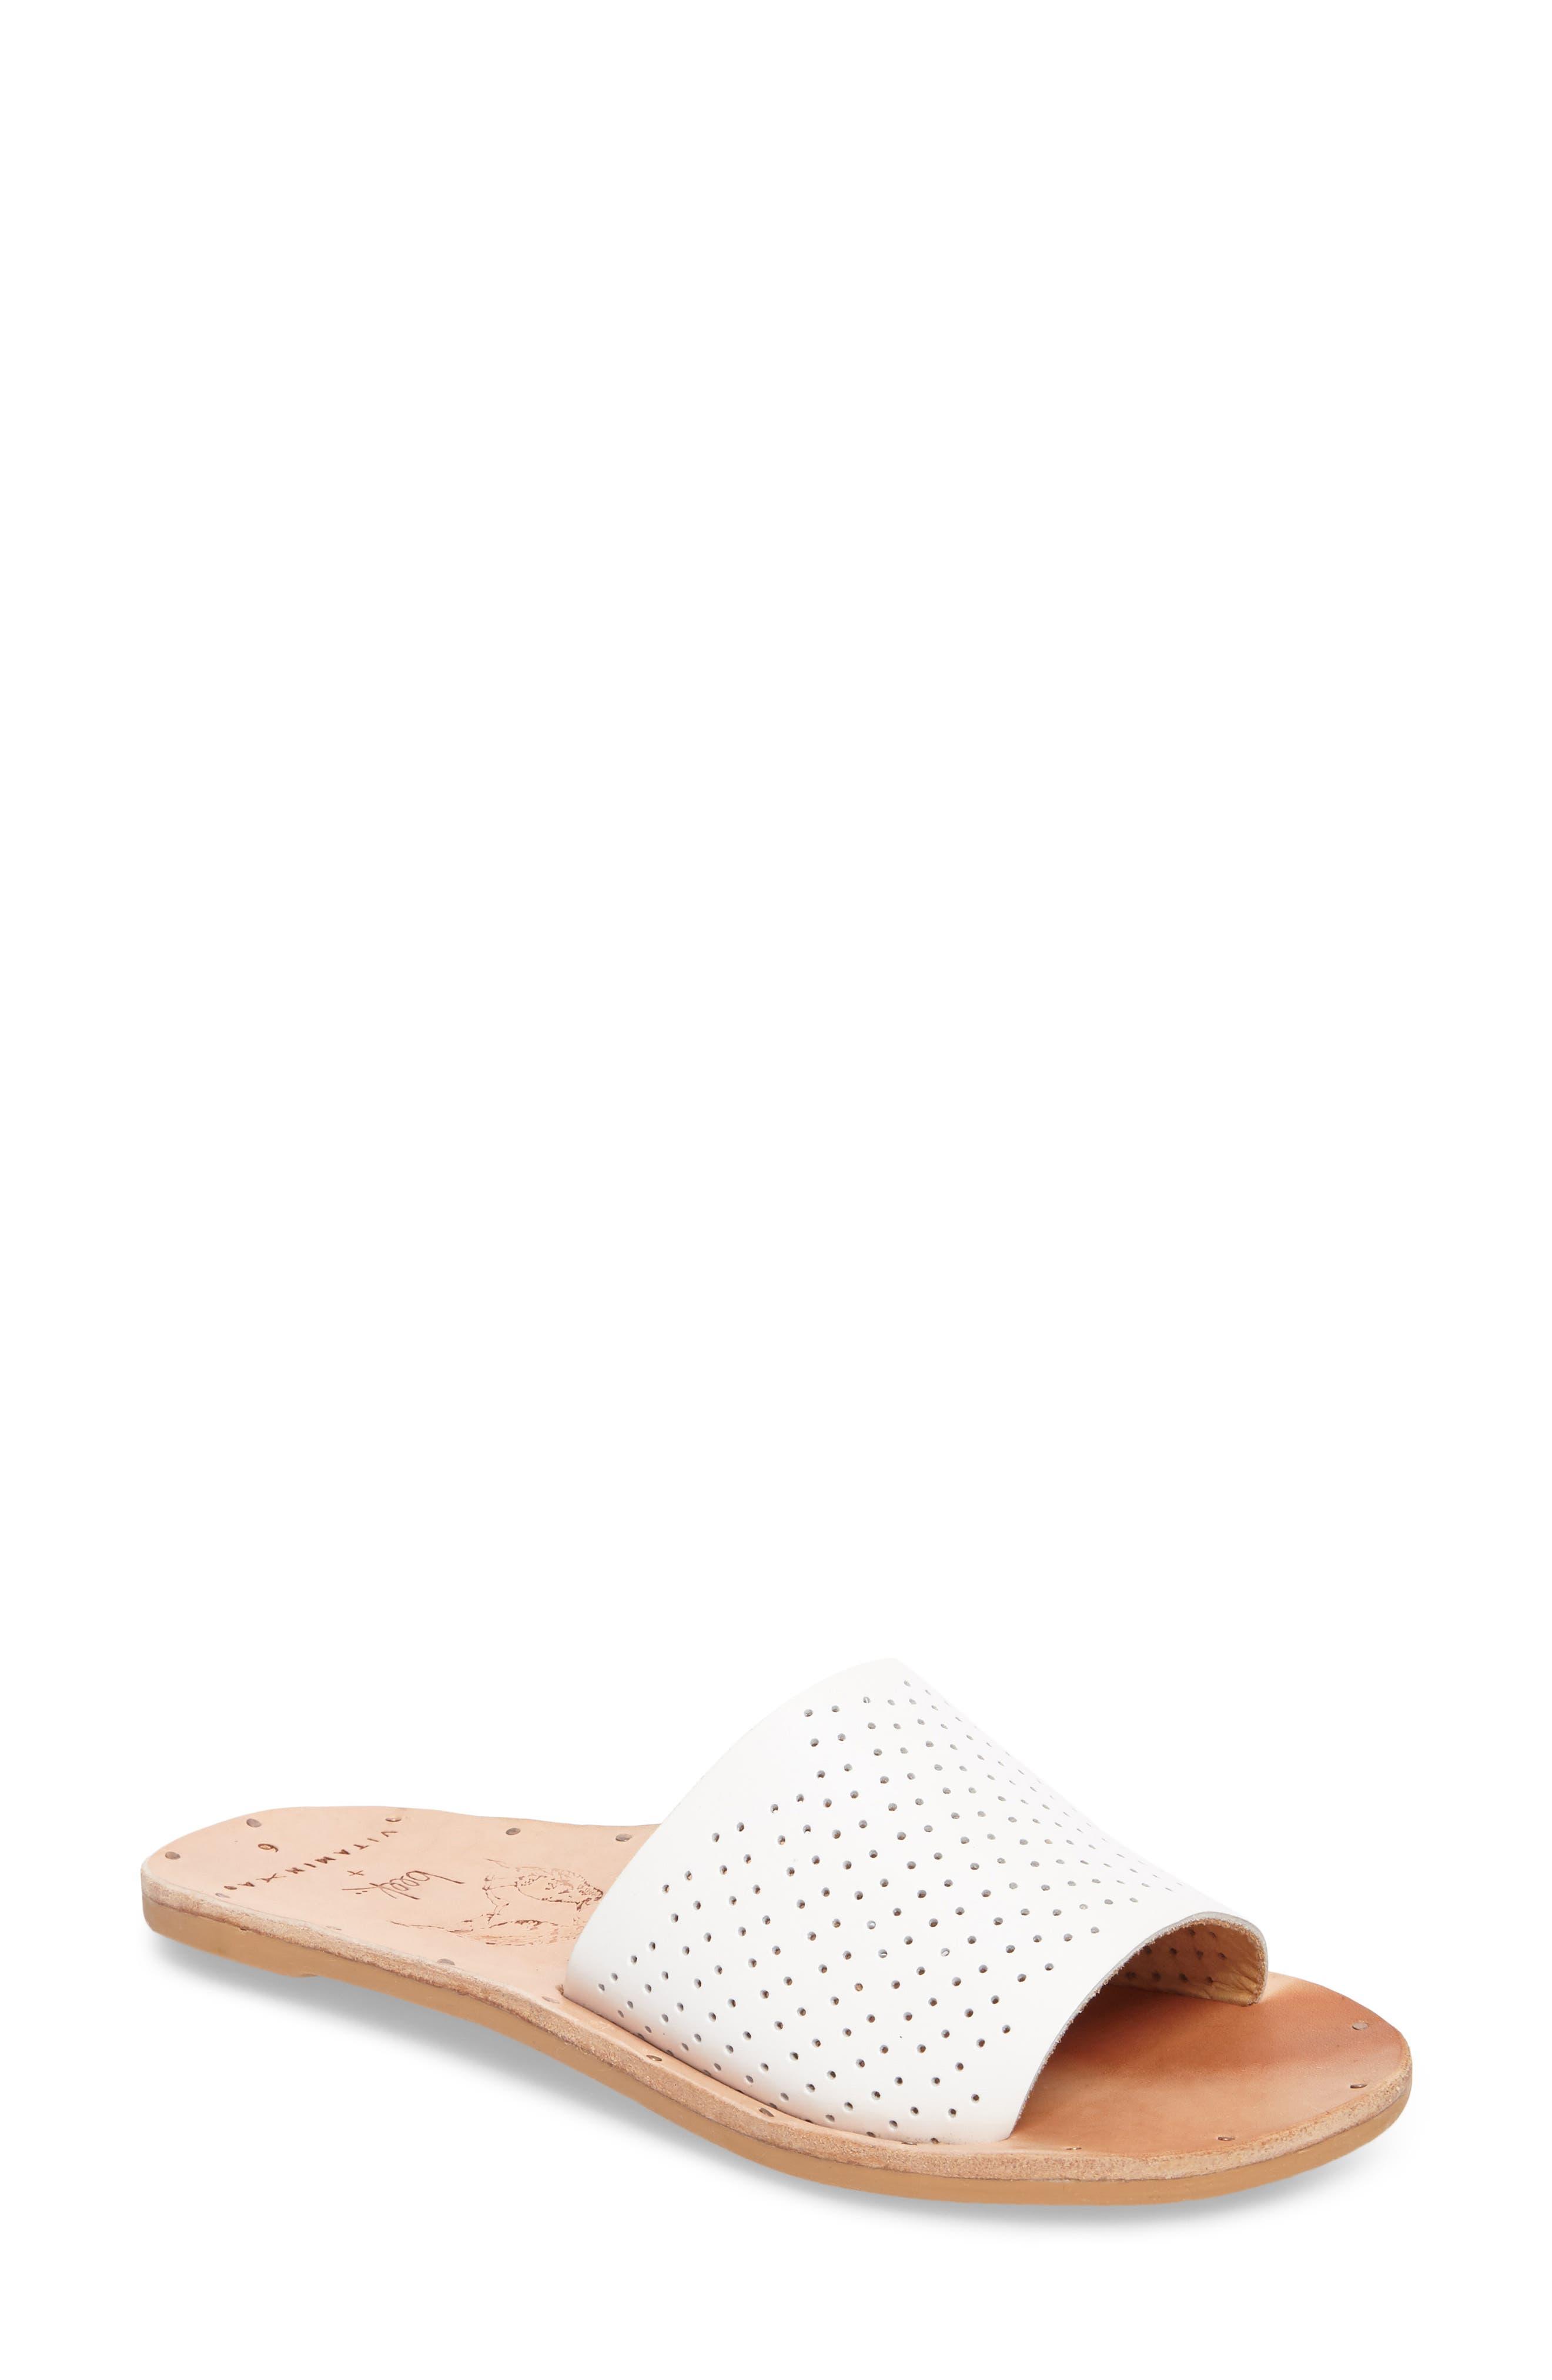 Main Image - Beek Mockingbird Sandal (Women)